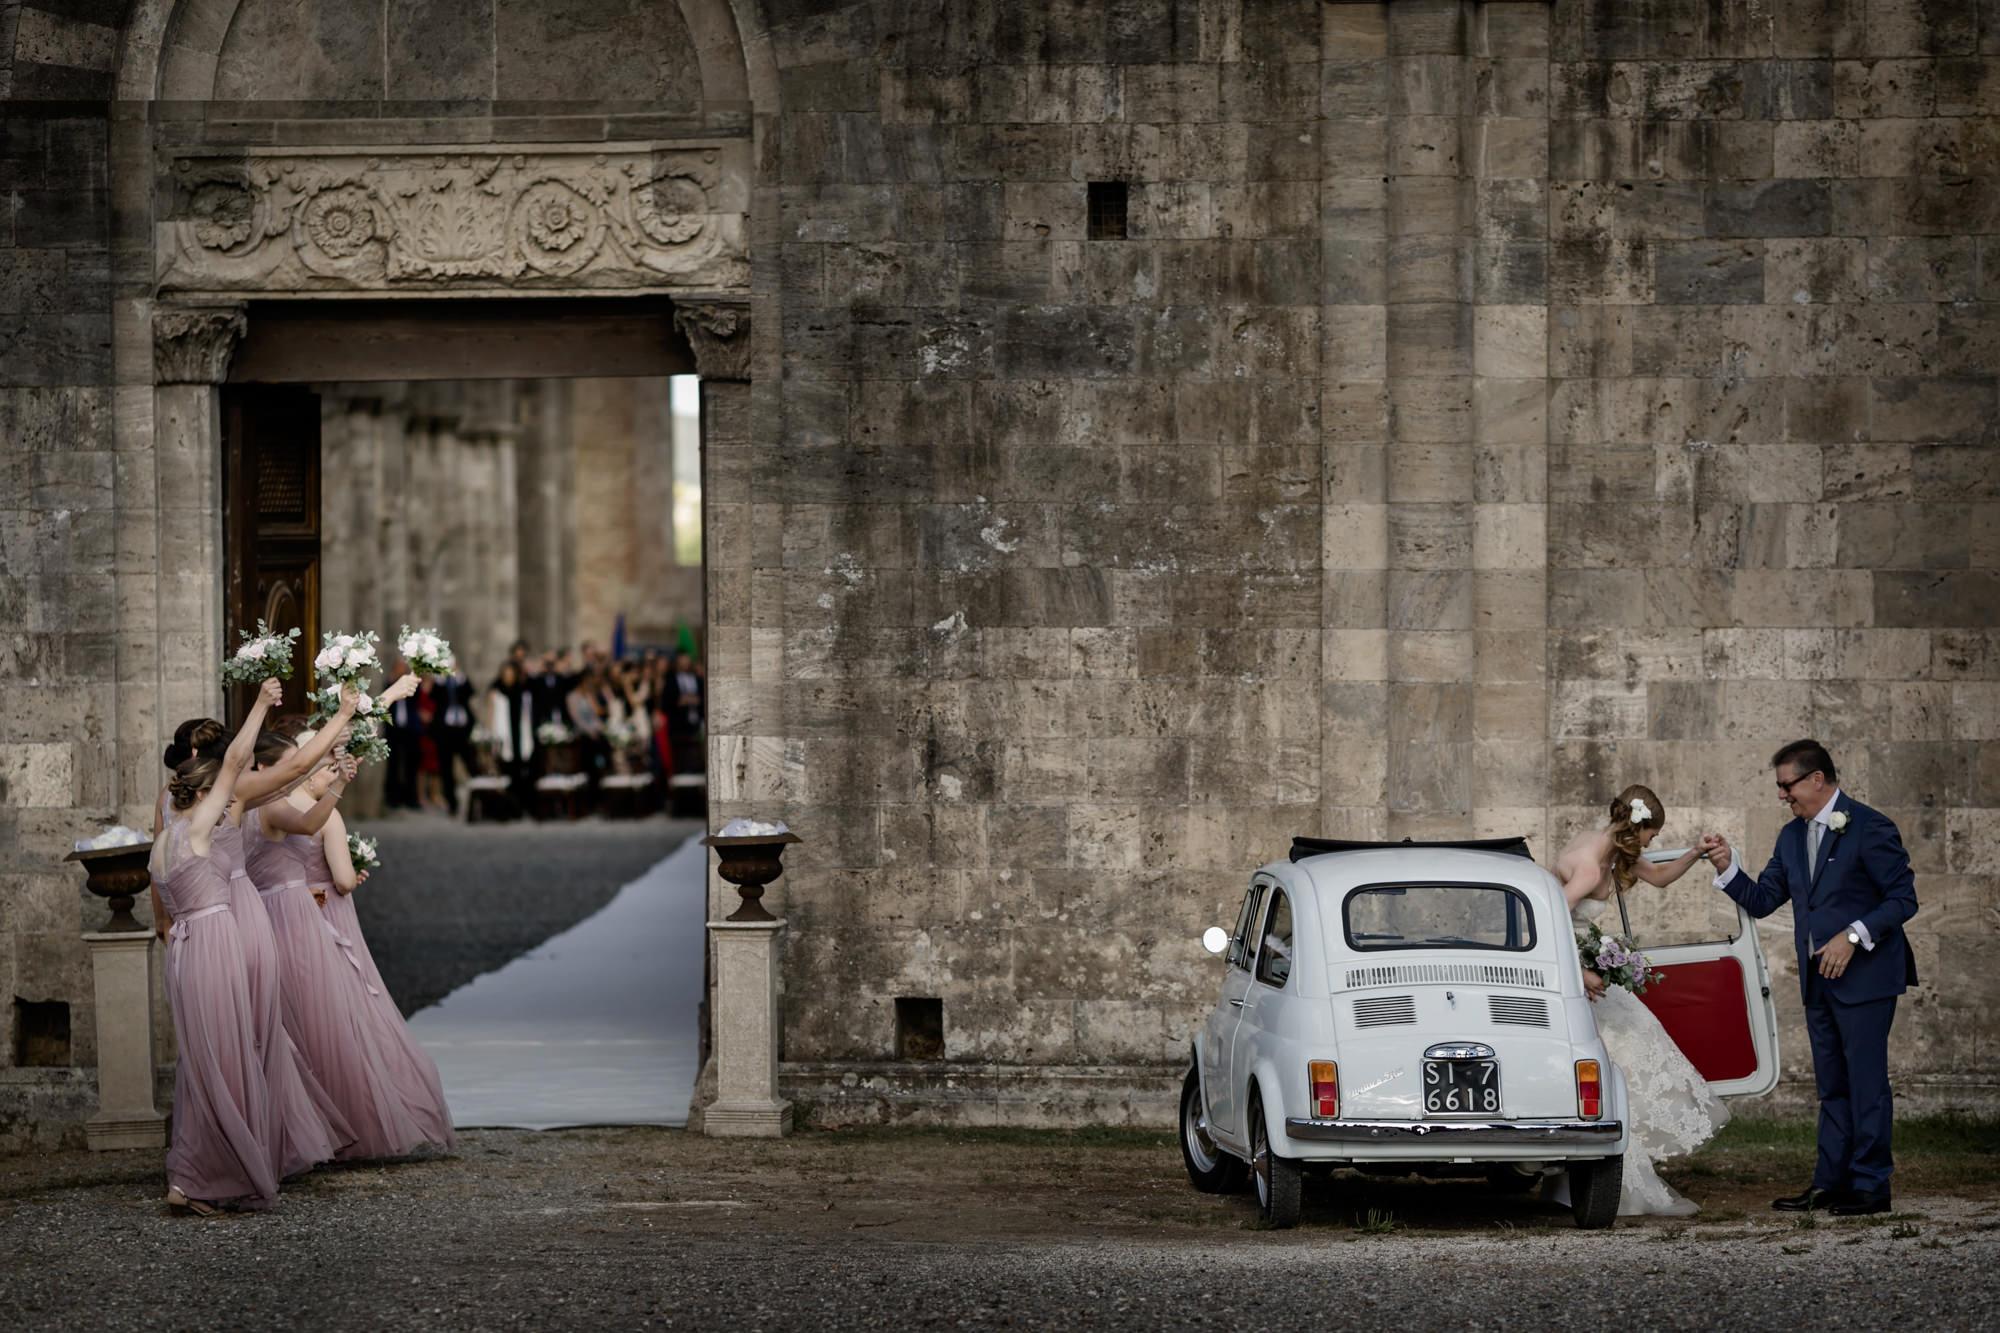 Bride arriving to ceremony photo by David Bastianoni